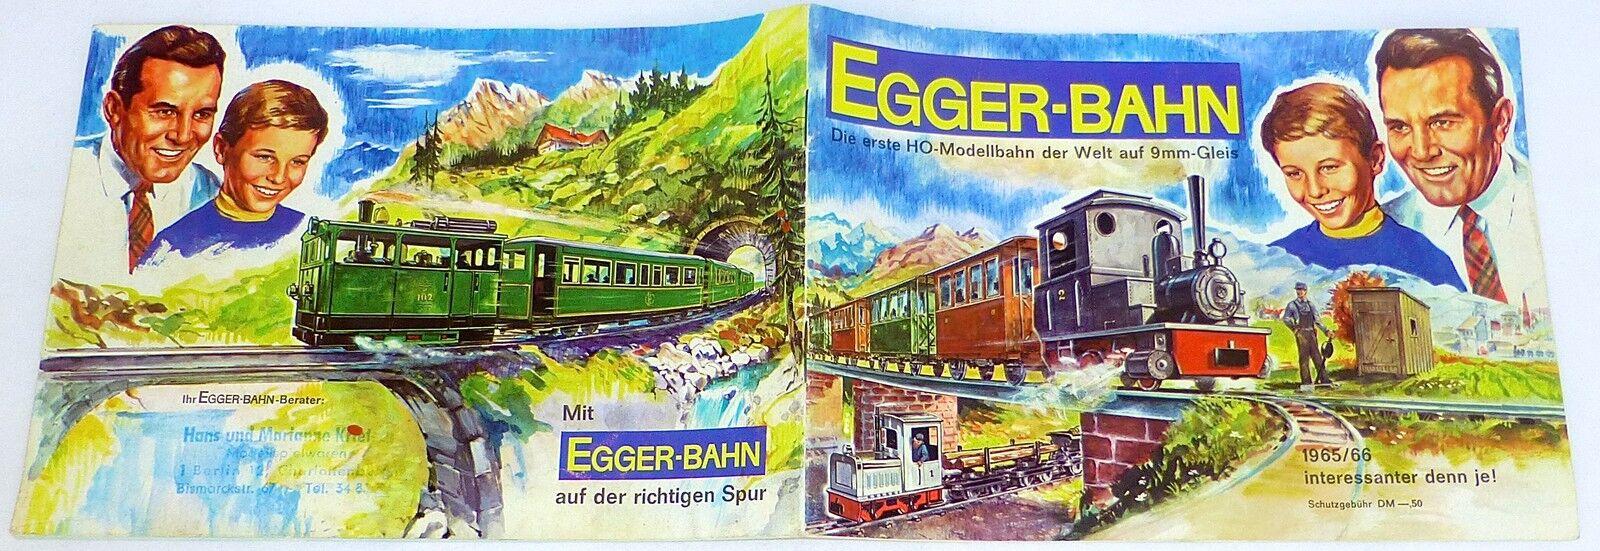 With egger Railroad auf der Law Scale Catalog 1965 1966 å